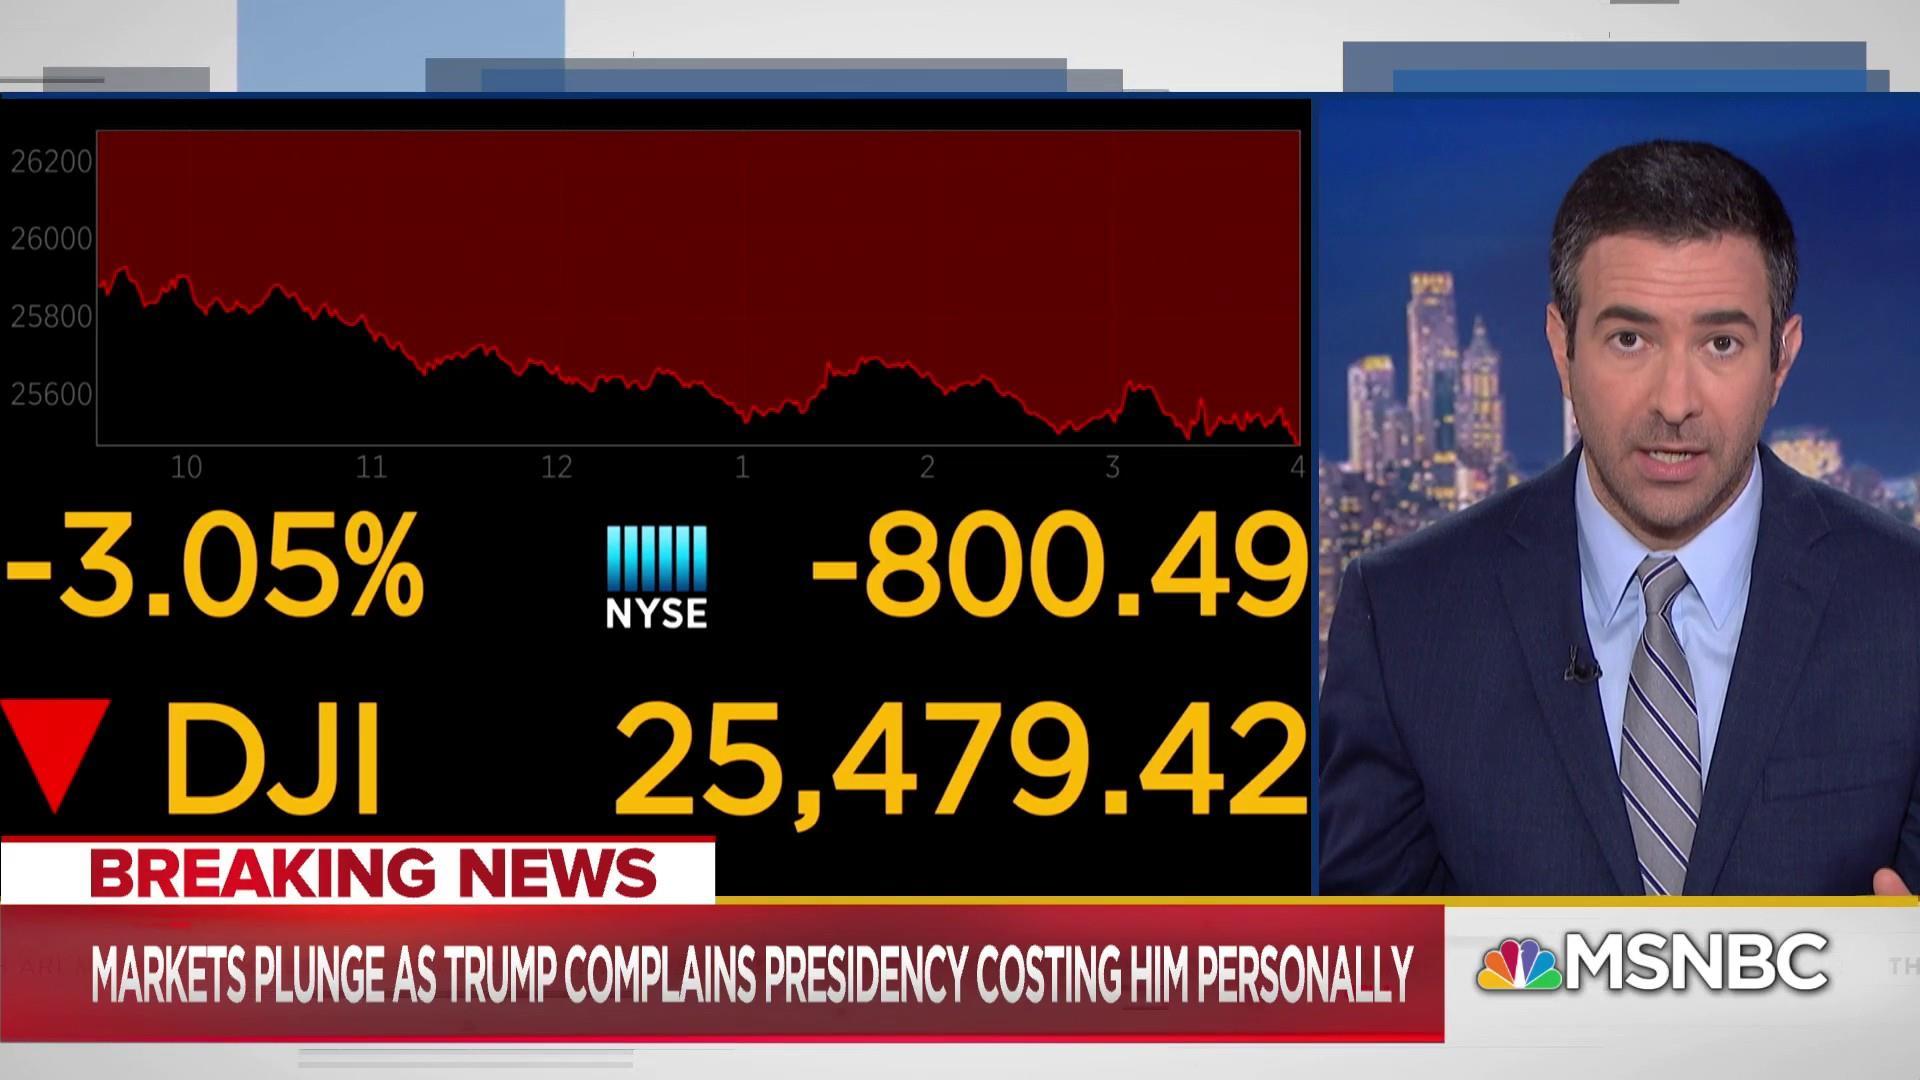 Trump battles self-made crises as markets tumble